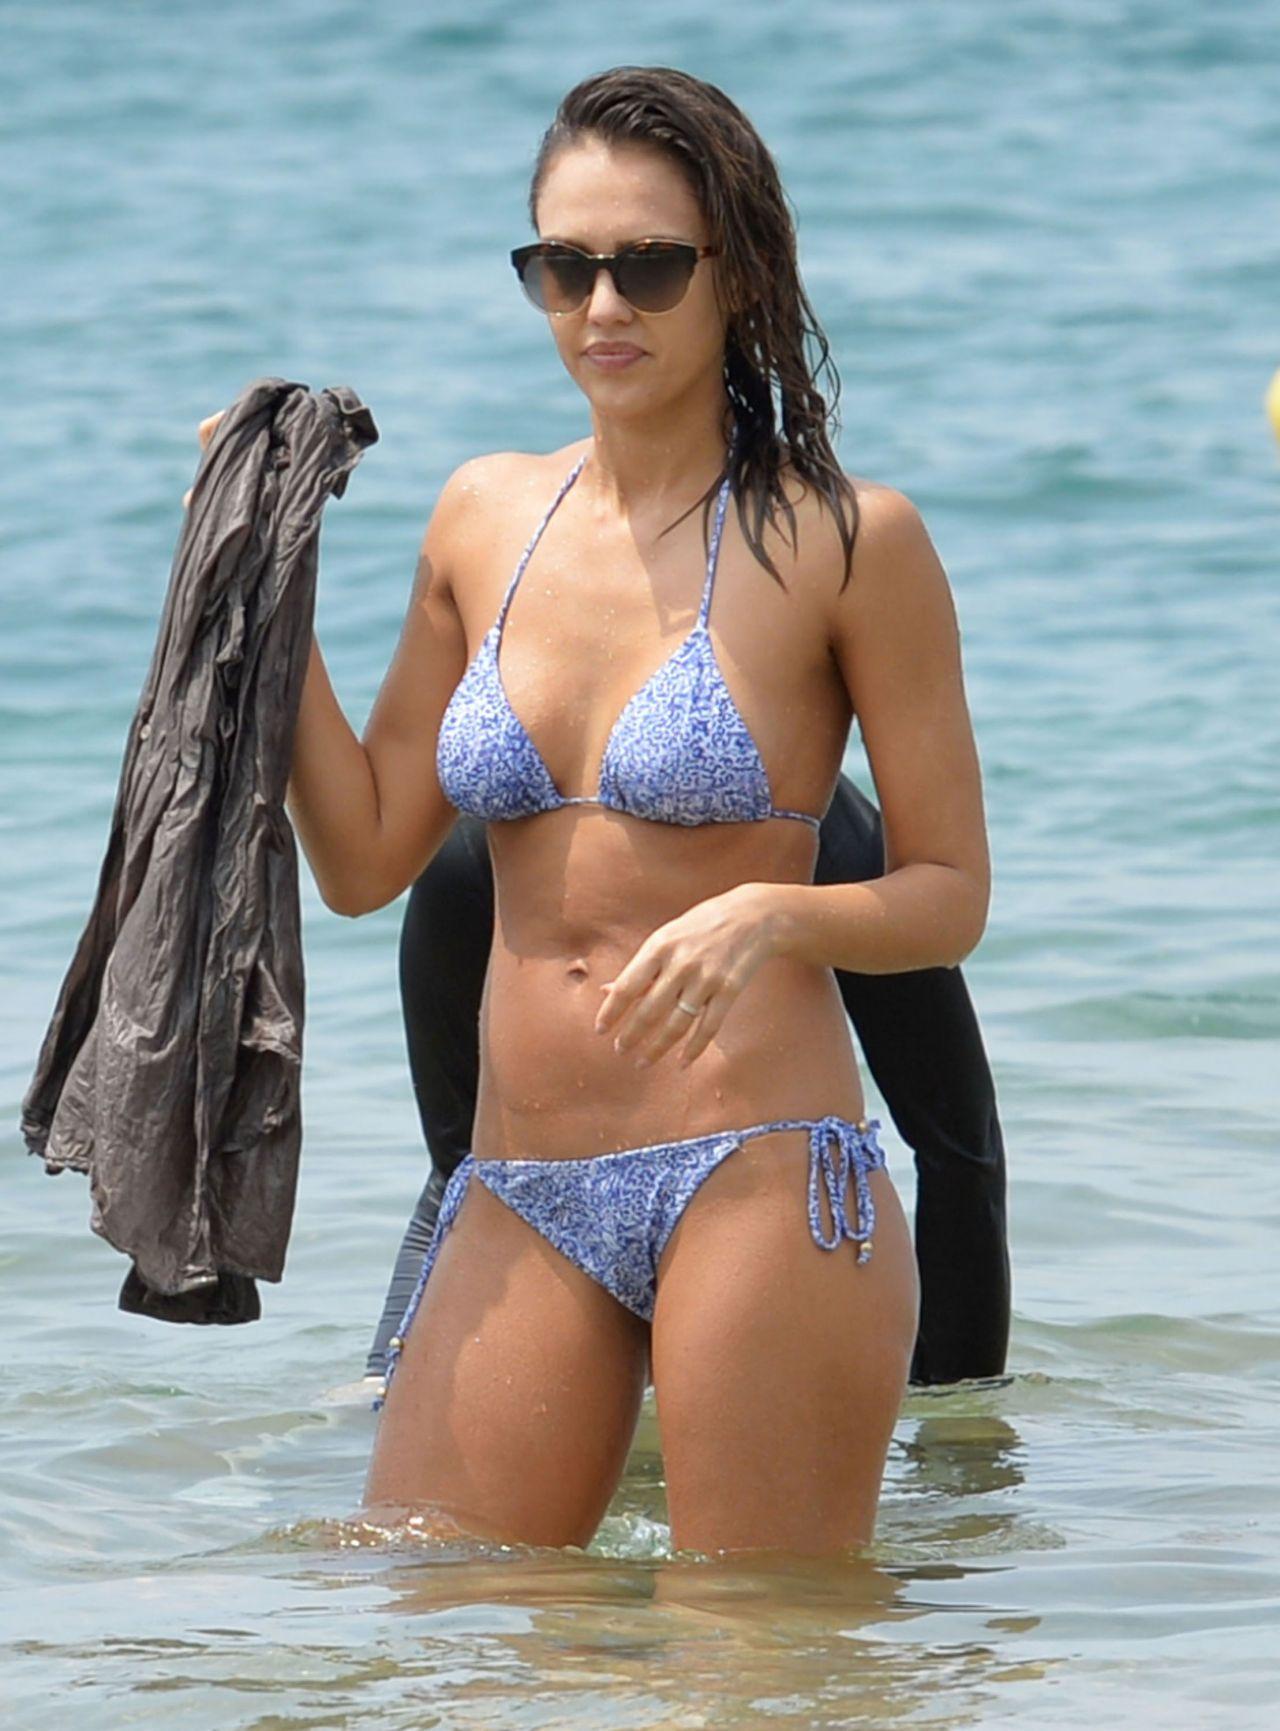 Jessica Alba Hot in Bikini - at the Beach in Hawaii, 3/22/2016